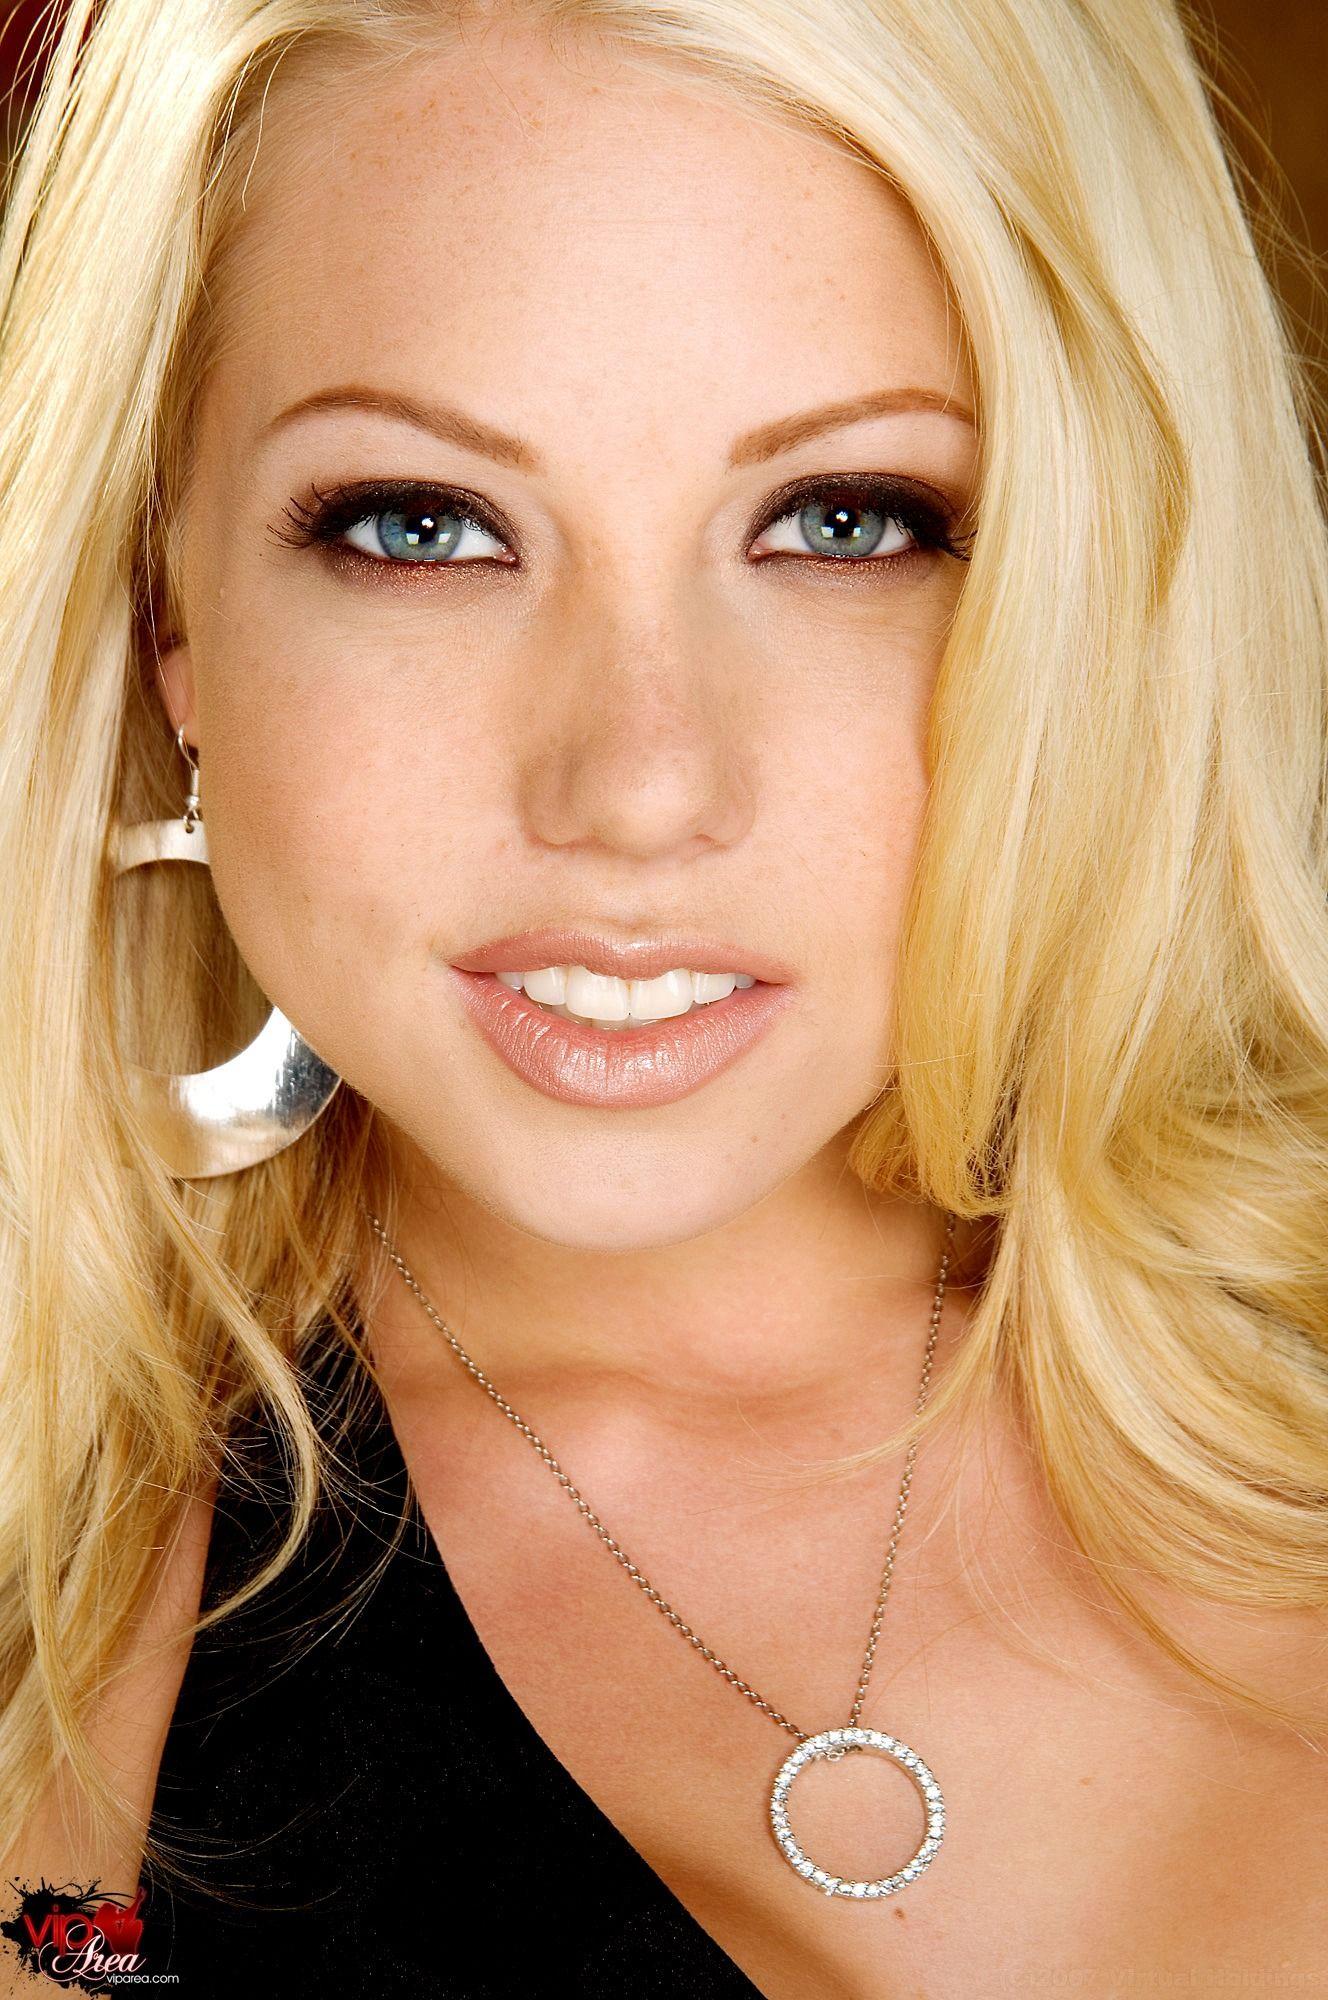 Shawna Lenee - The Good Girl - Glam Babes Blog